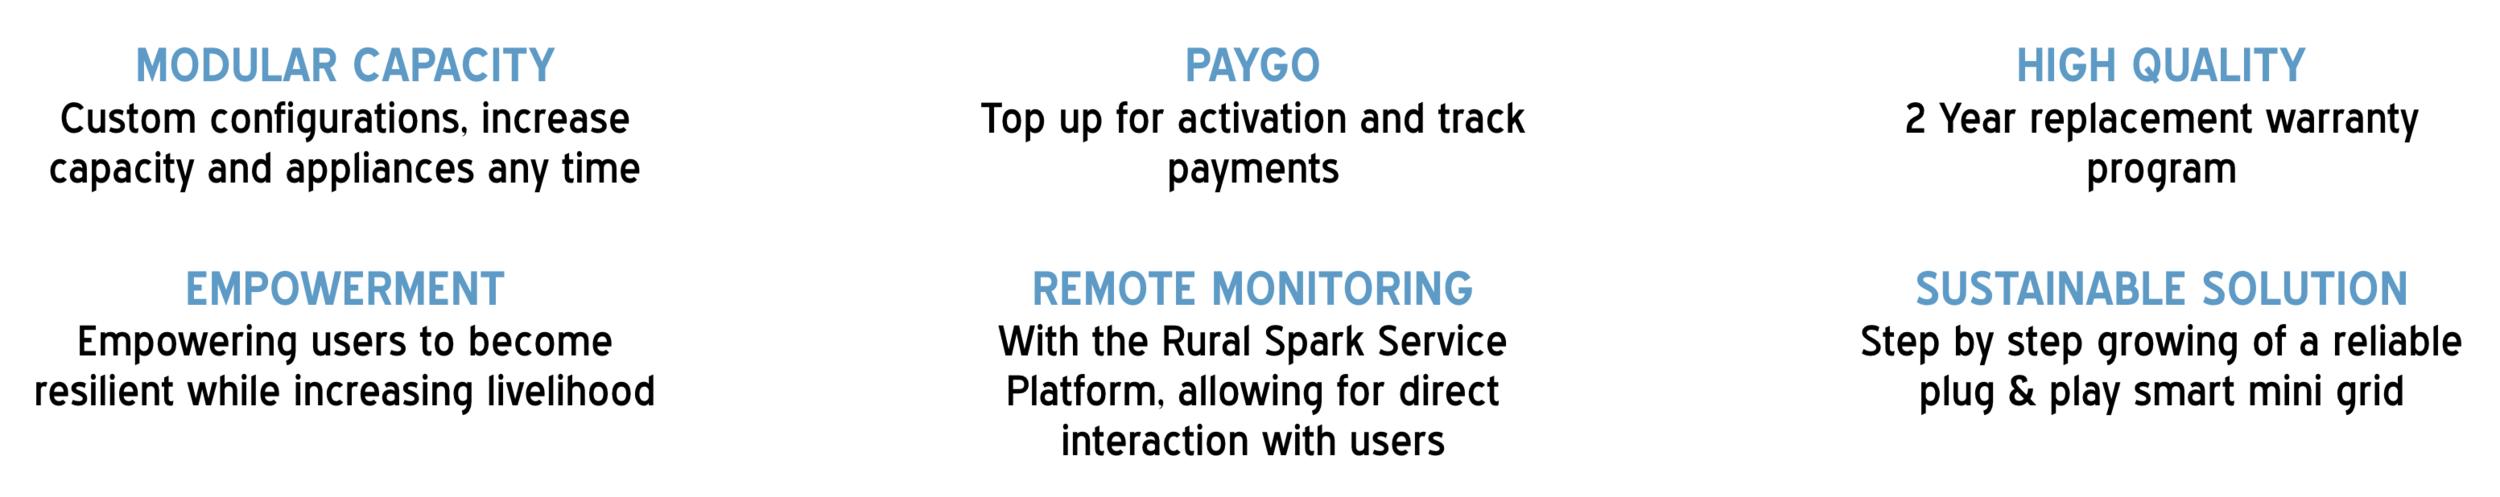 Rural Spark Kit Key Characteristics.png